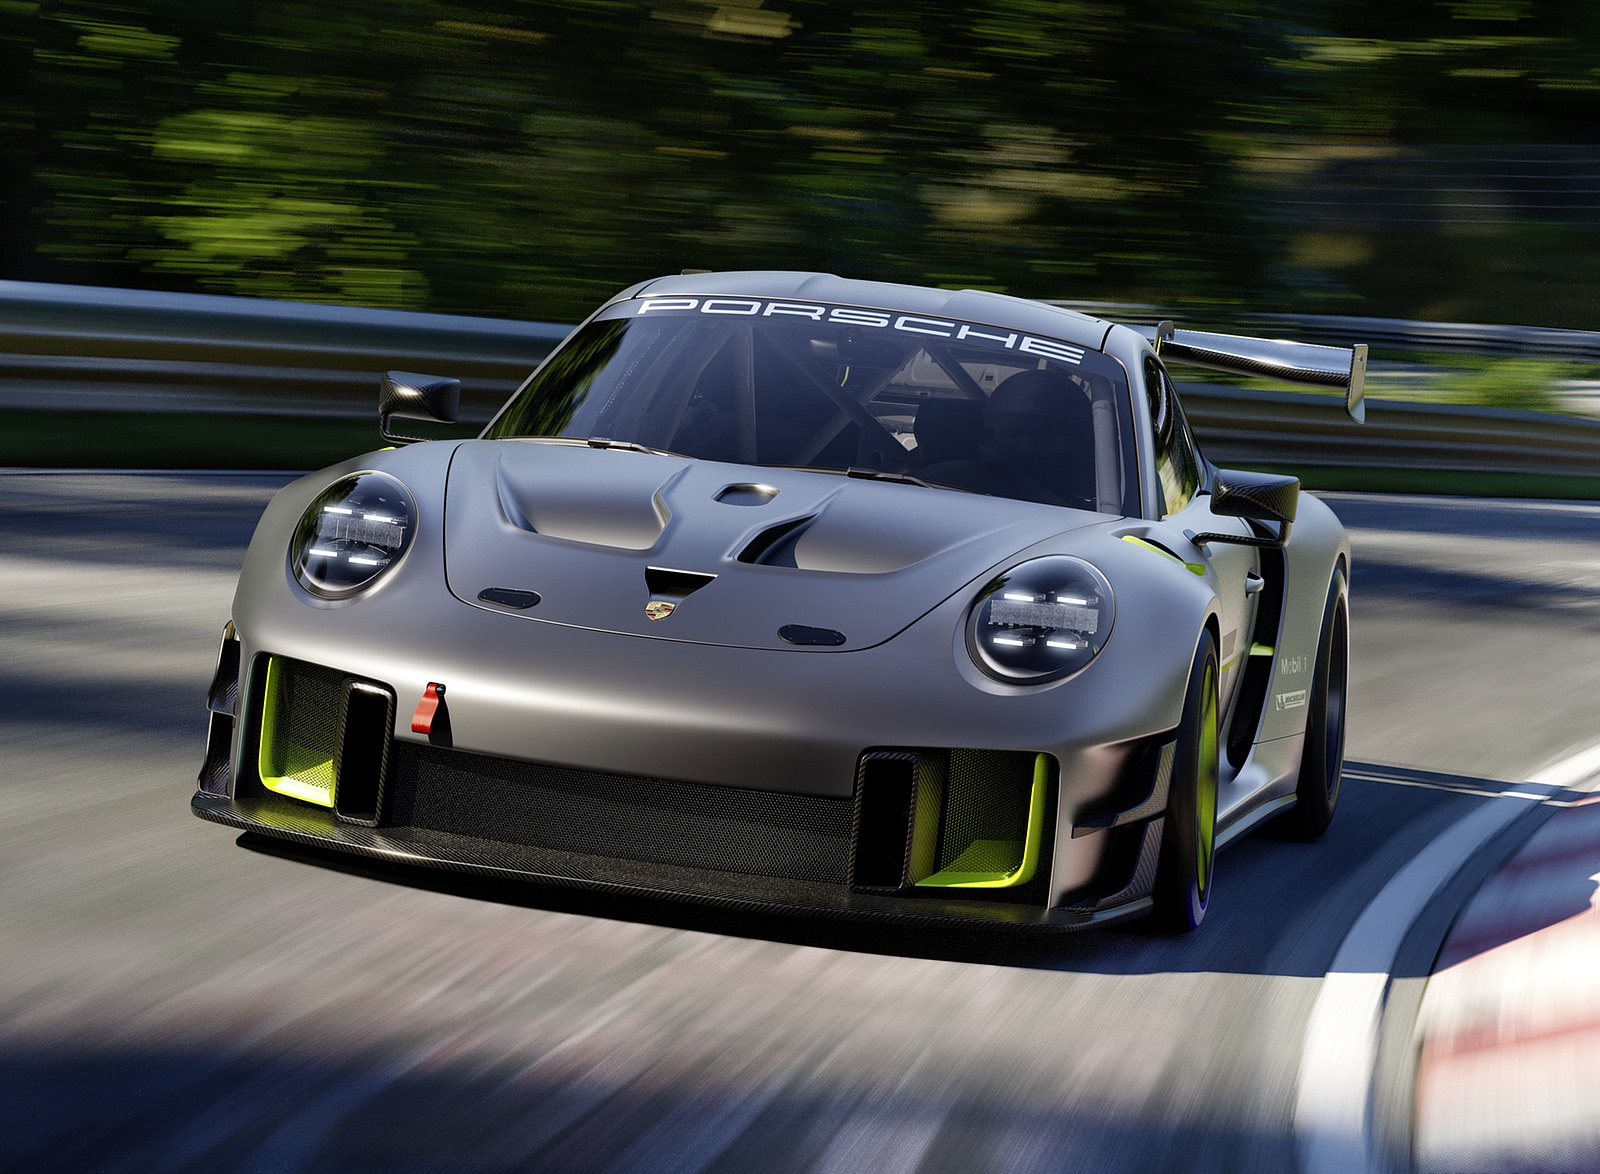 2022 Porsche 911 GT2 RS Clubsport 25 Front Wallpapers (1)